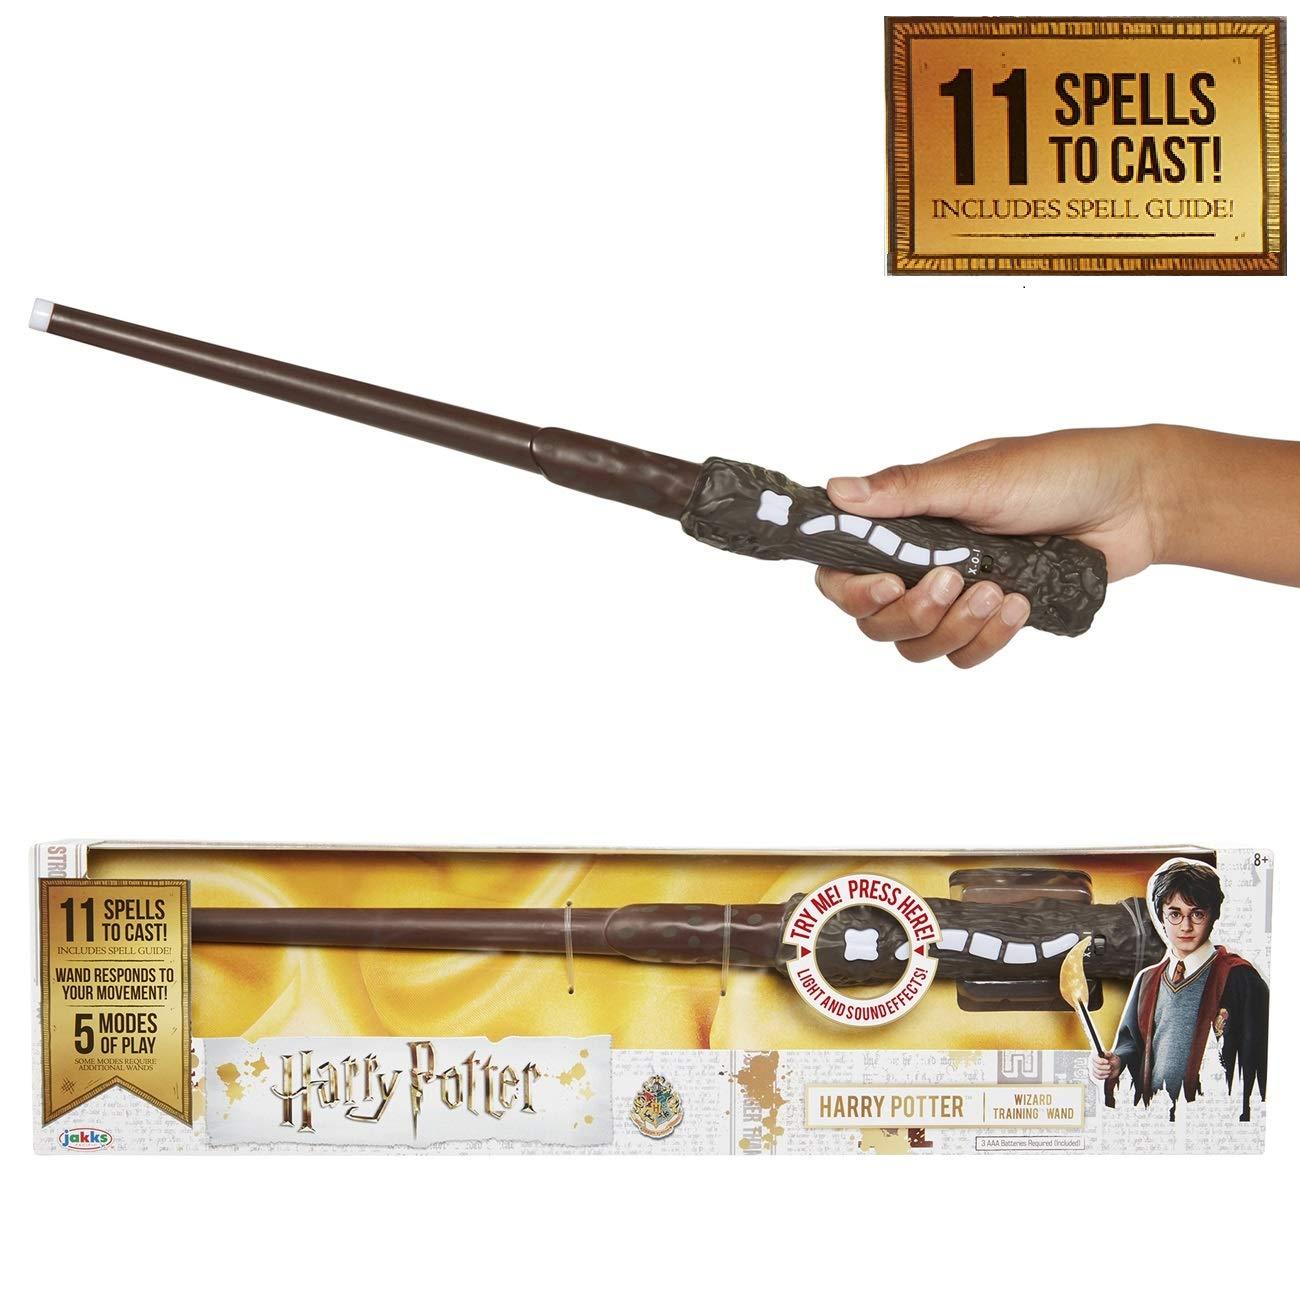 Jakks Pacific Varita Magica con hechizos-Harry Potter, Hermione, etc